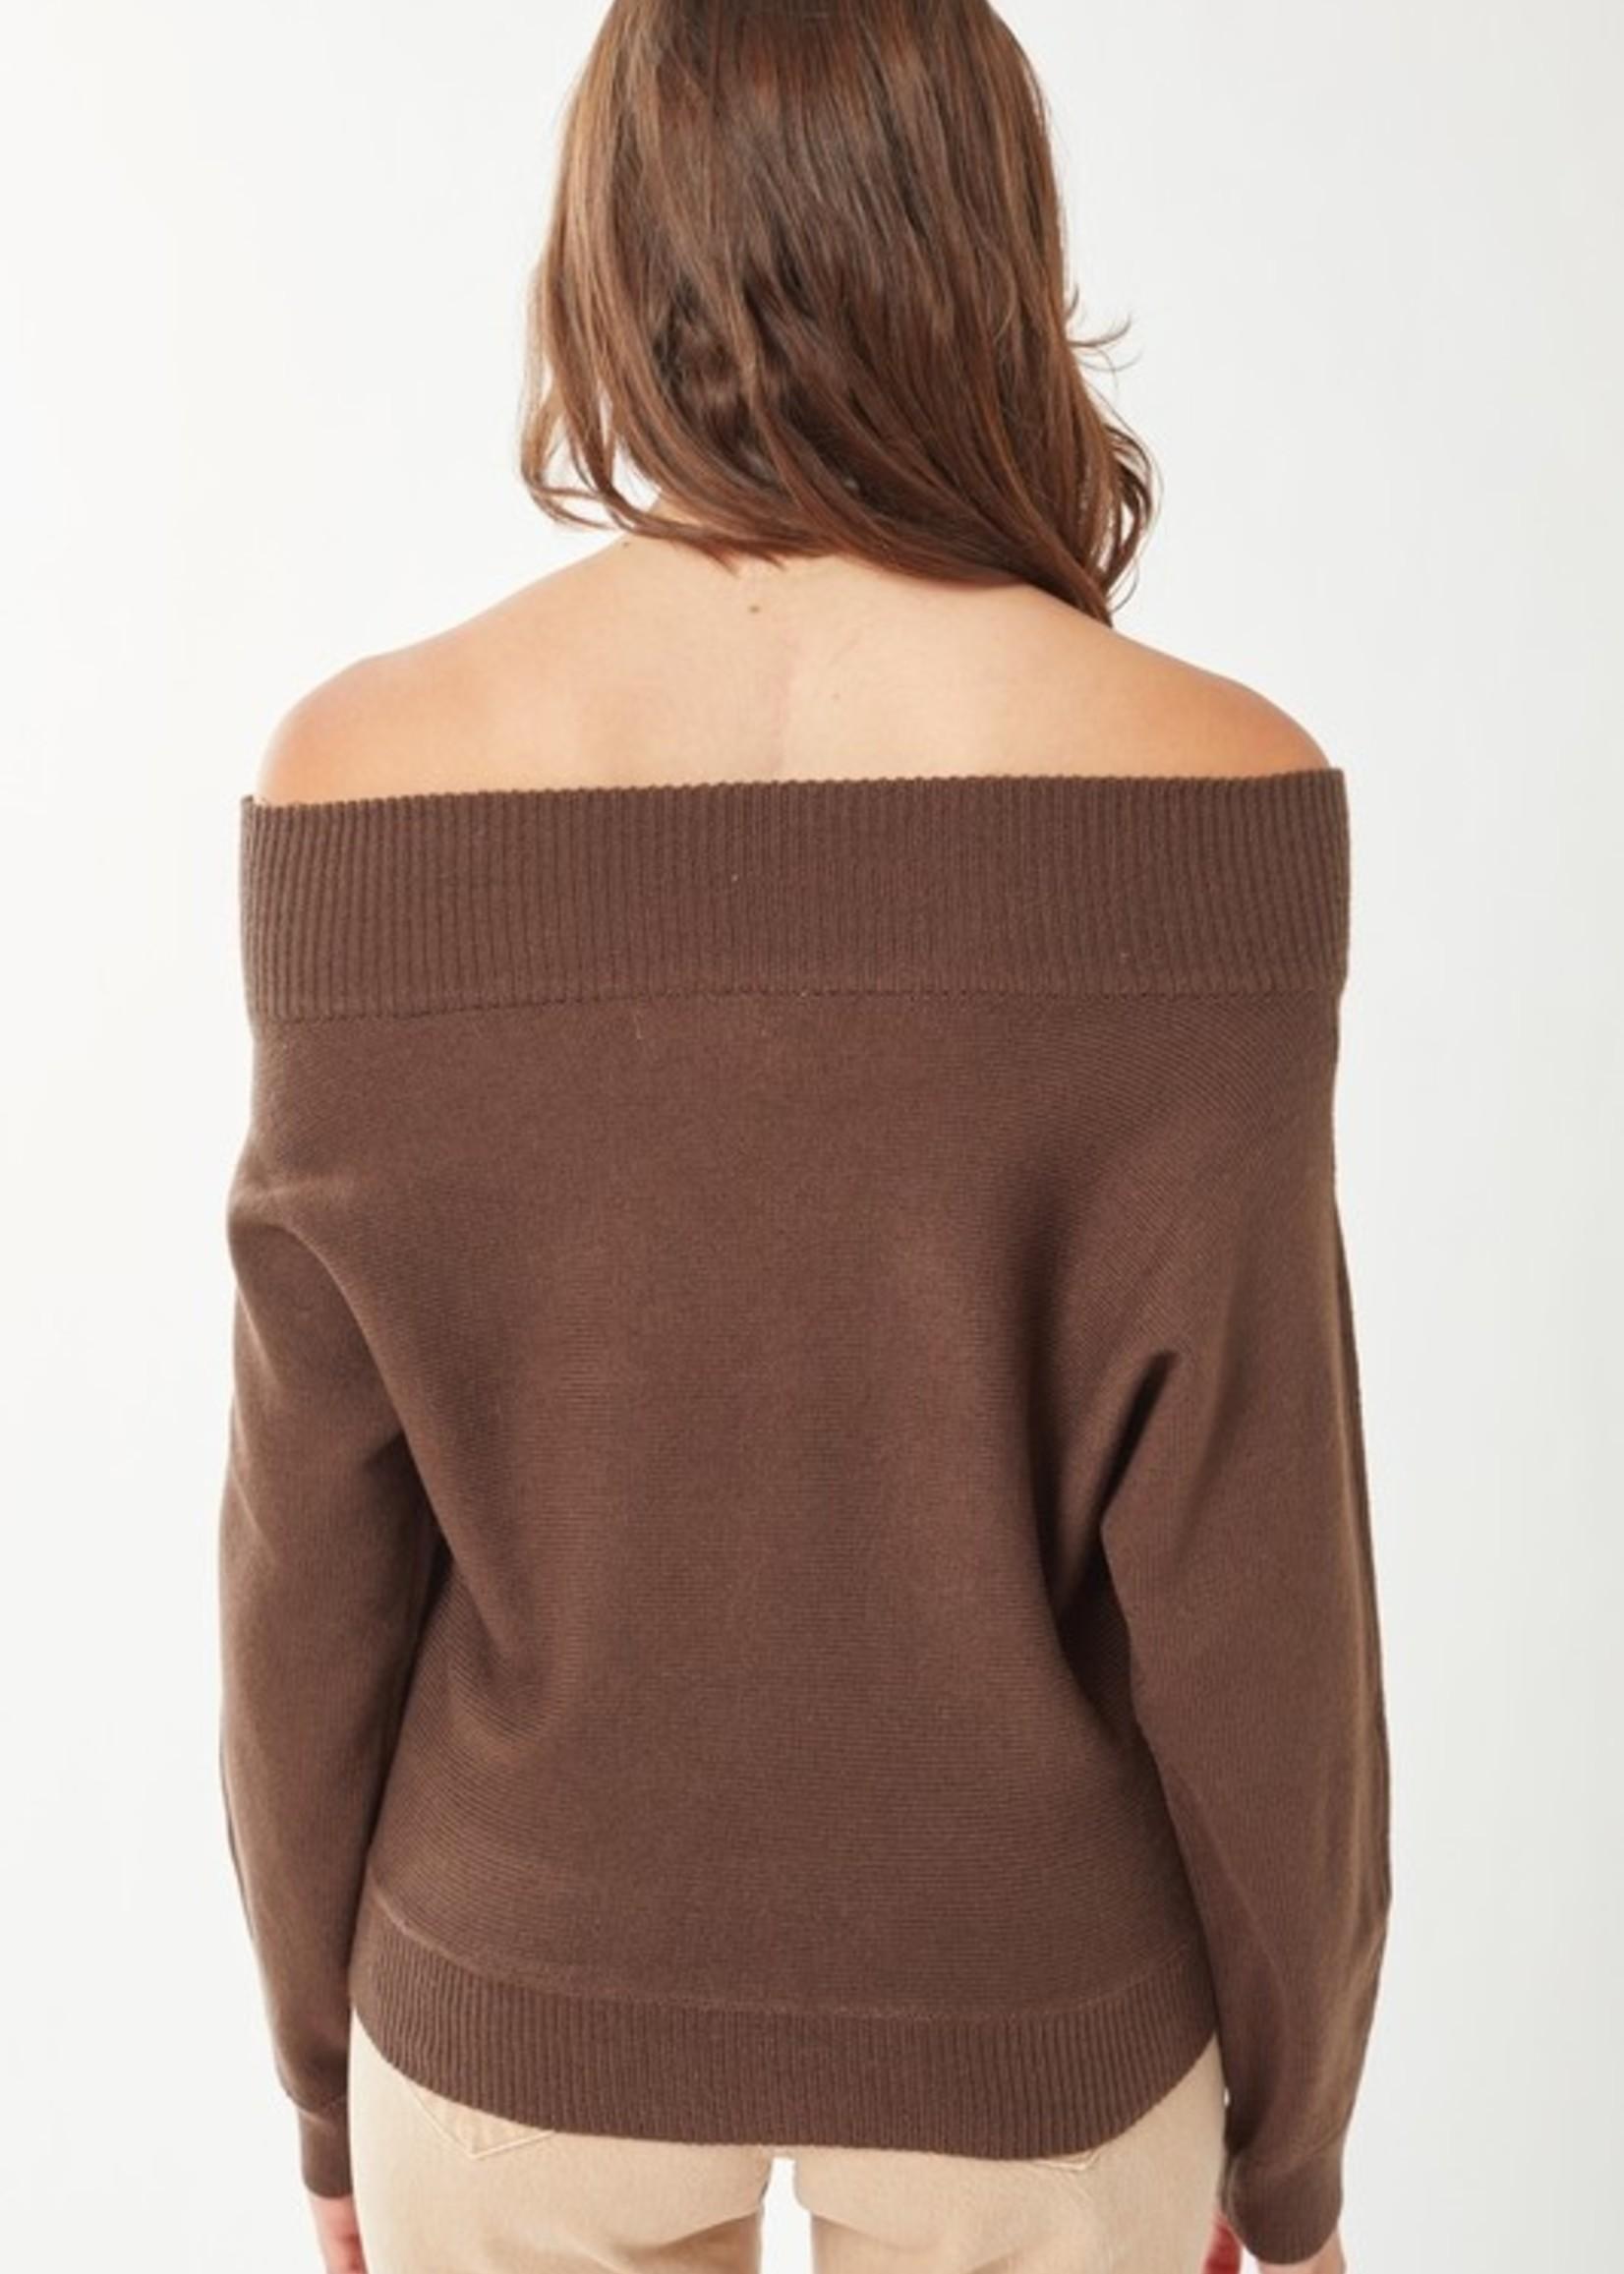 Off shoulder sweater 2 colors